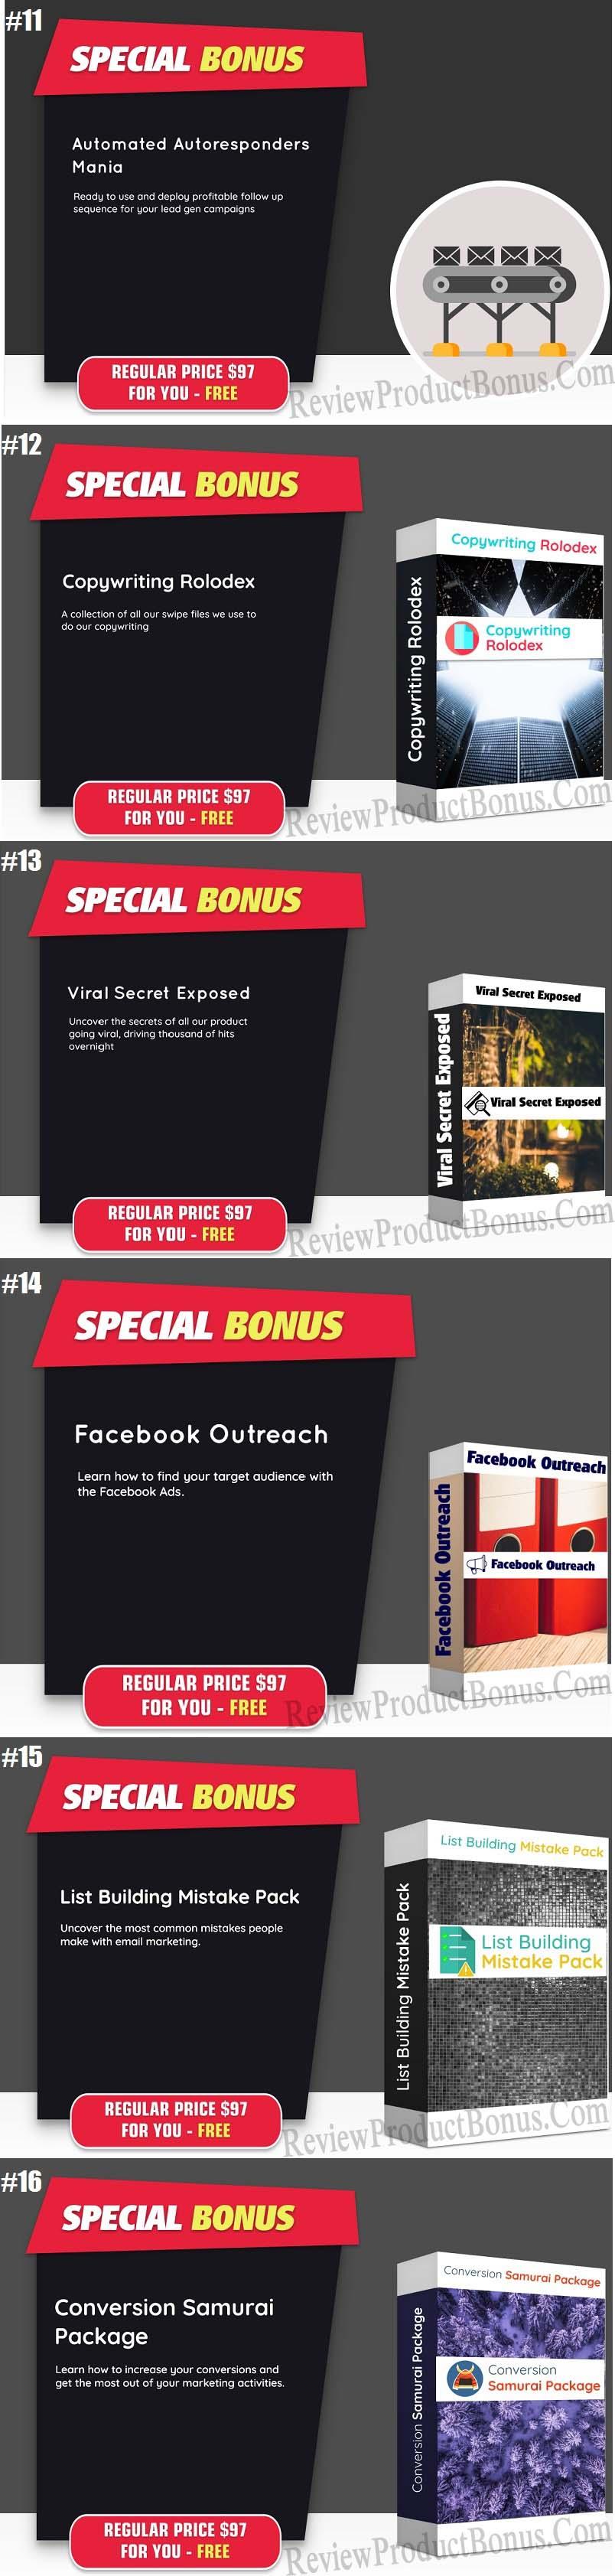 LetSlotio Special Bonus